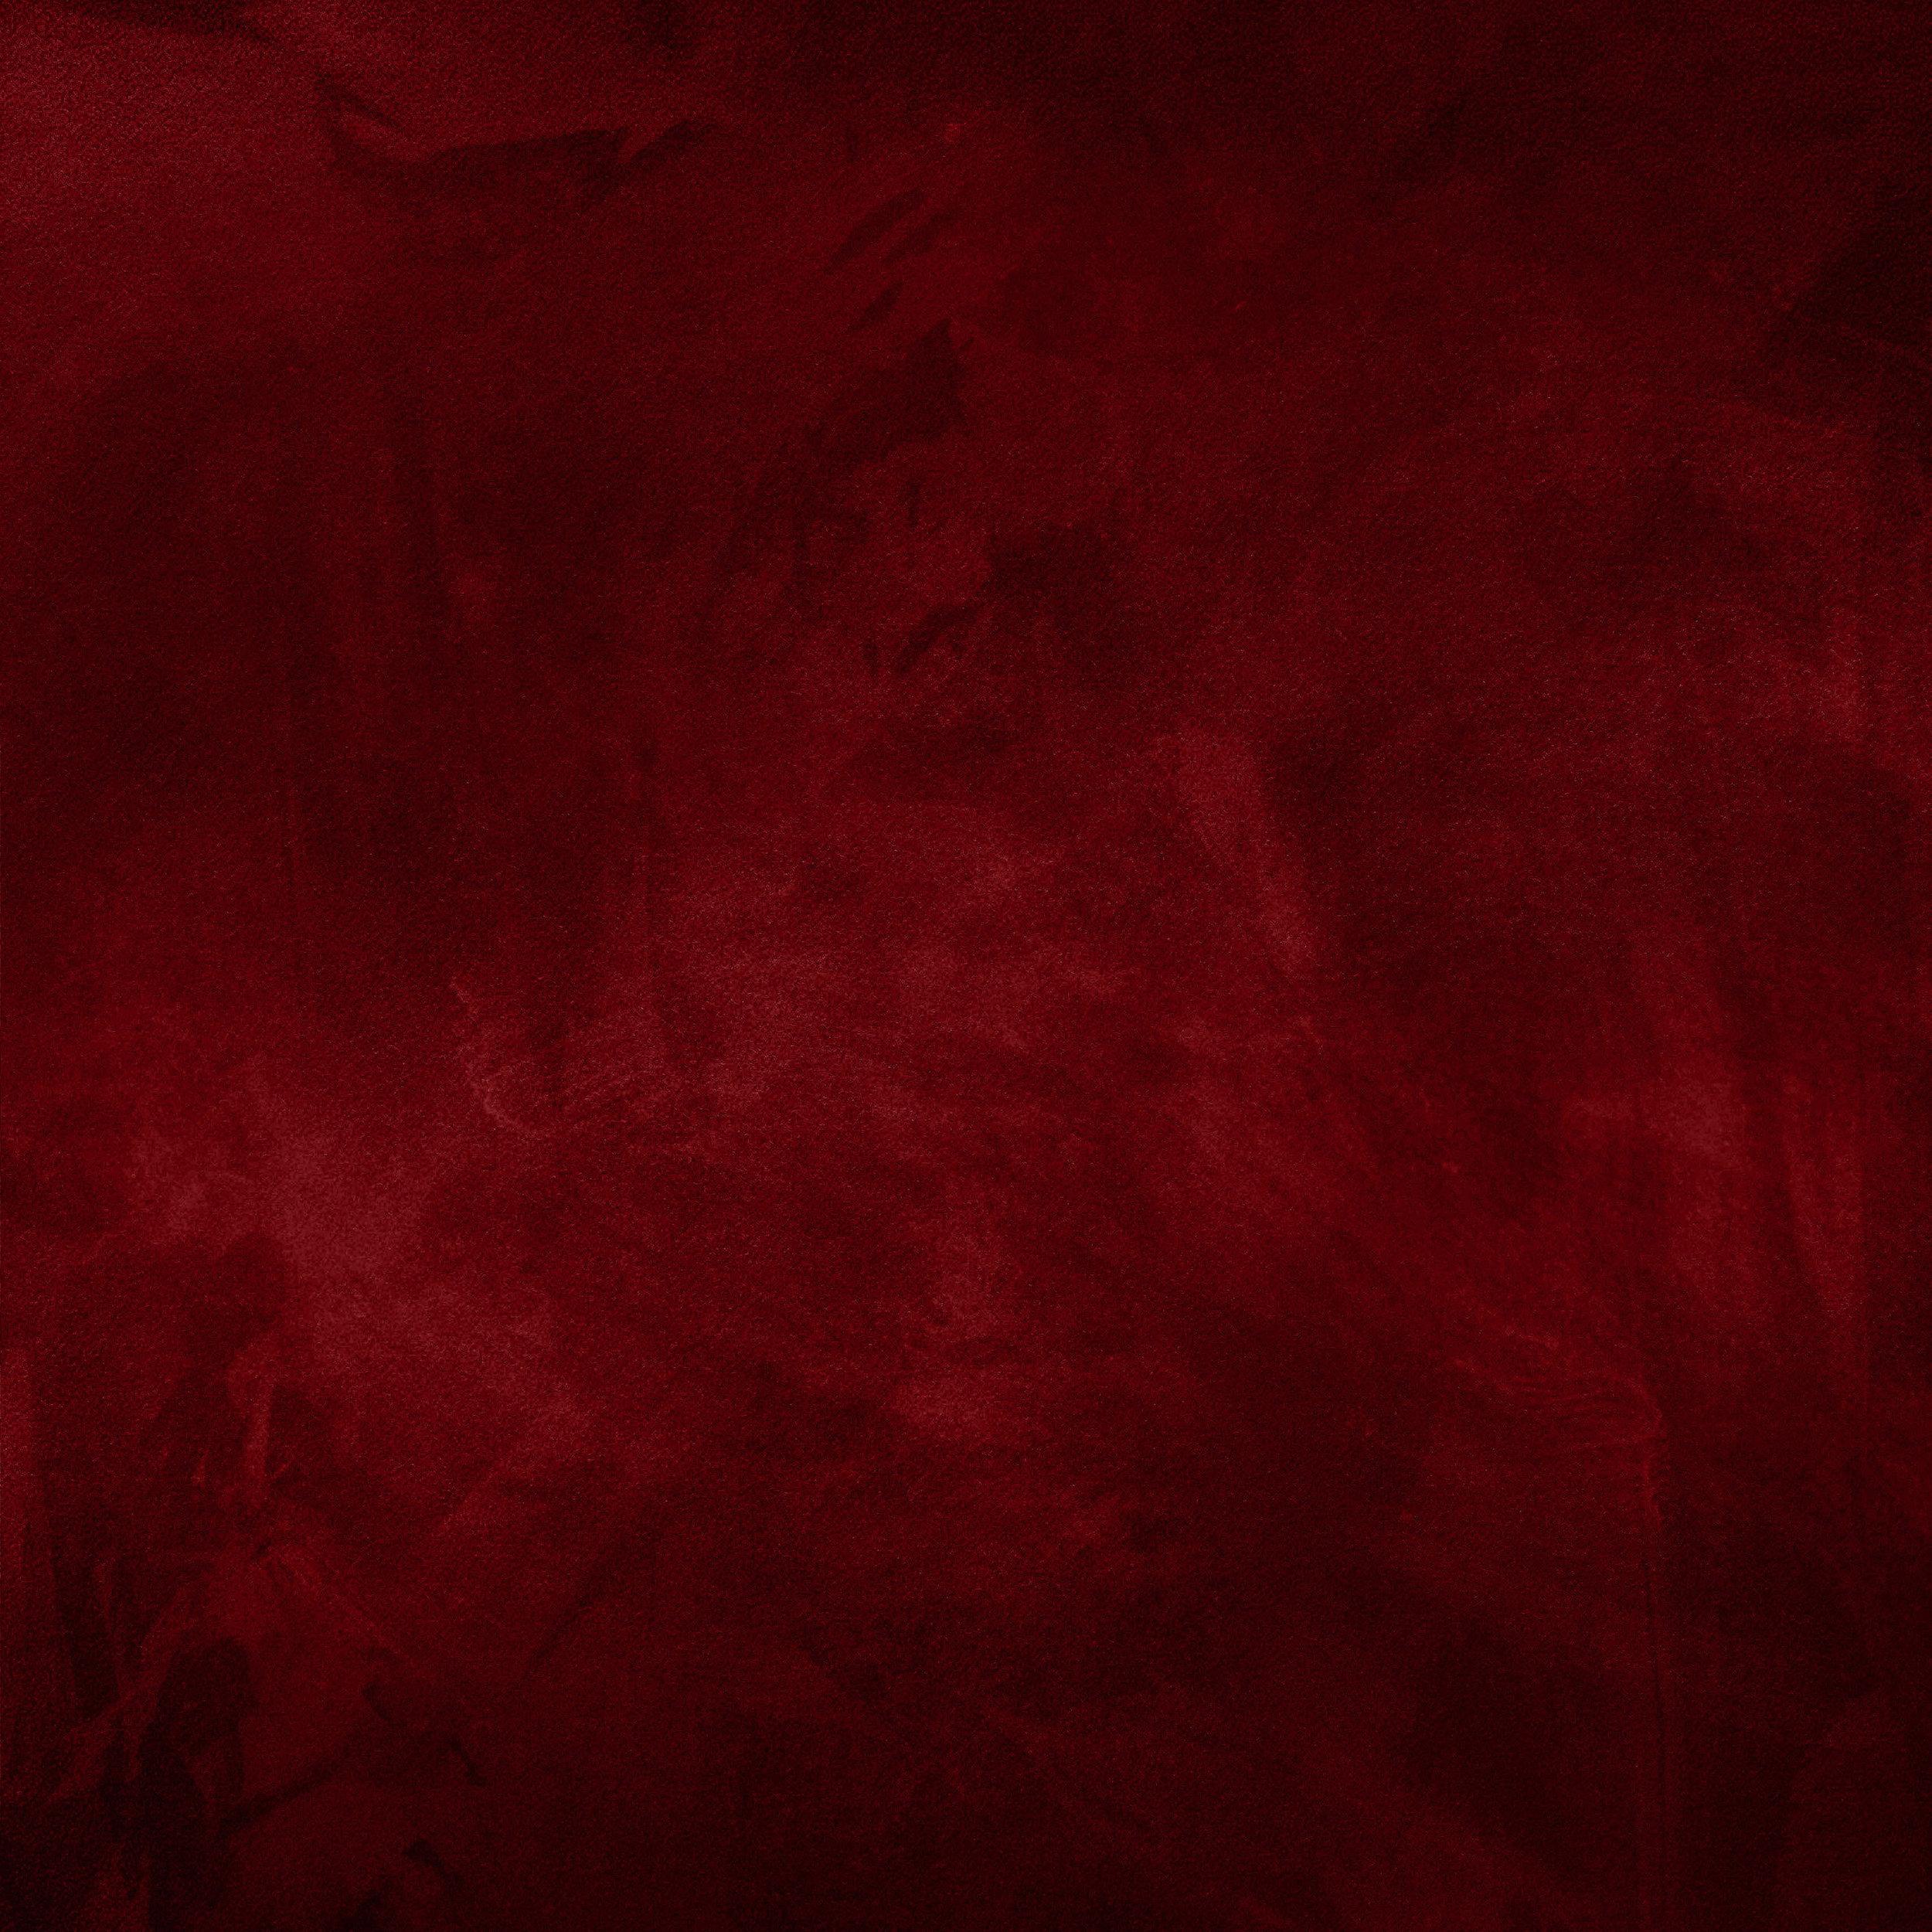 texture_0010_x.jpg